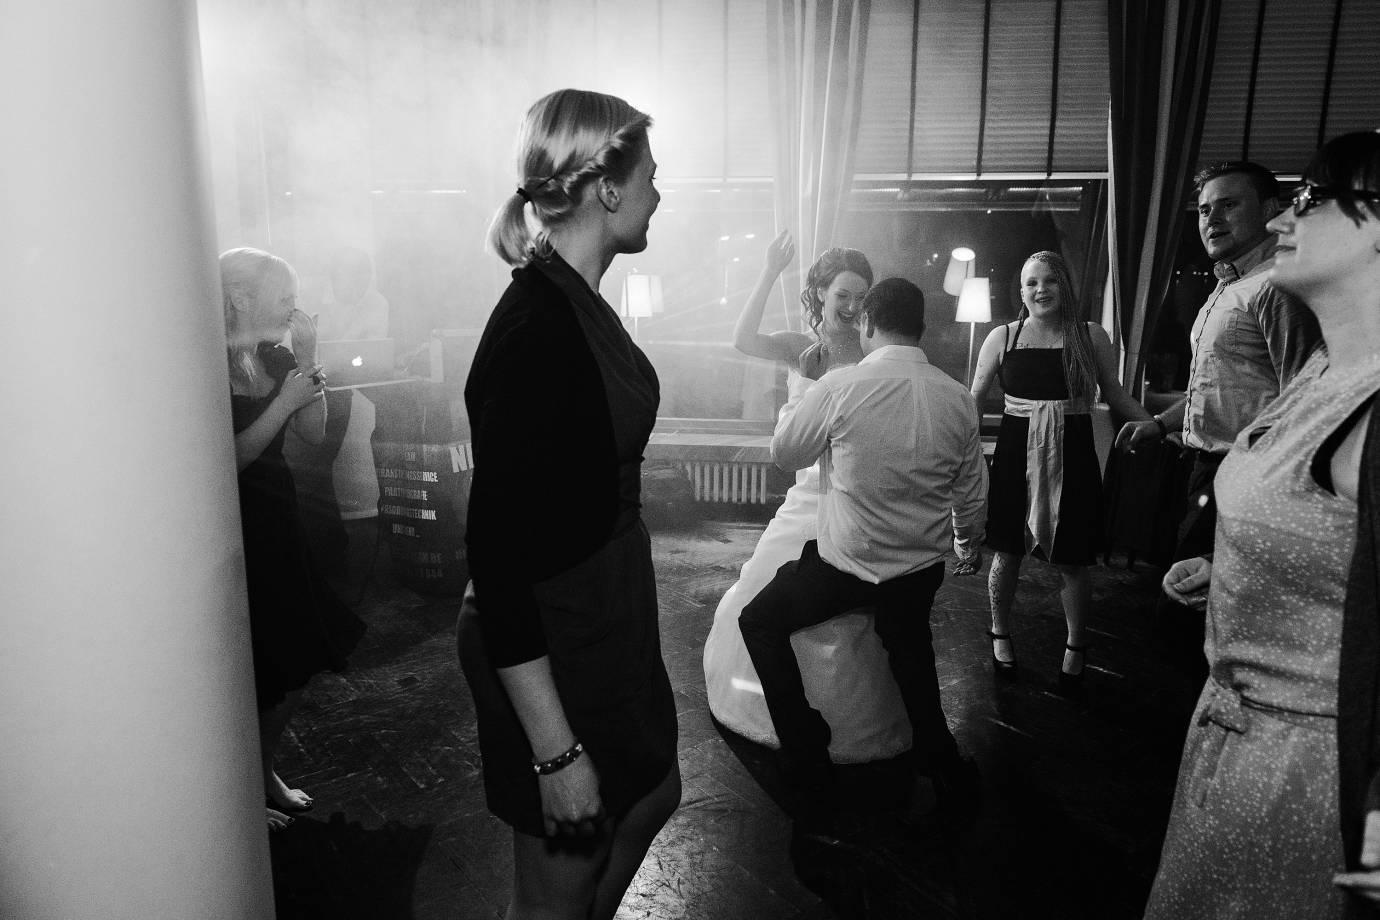 hochzeitsfotograf ohz 183 - Johanna+Sascha